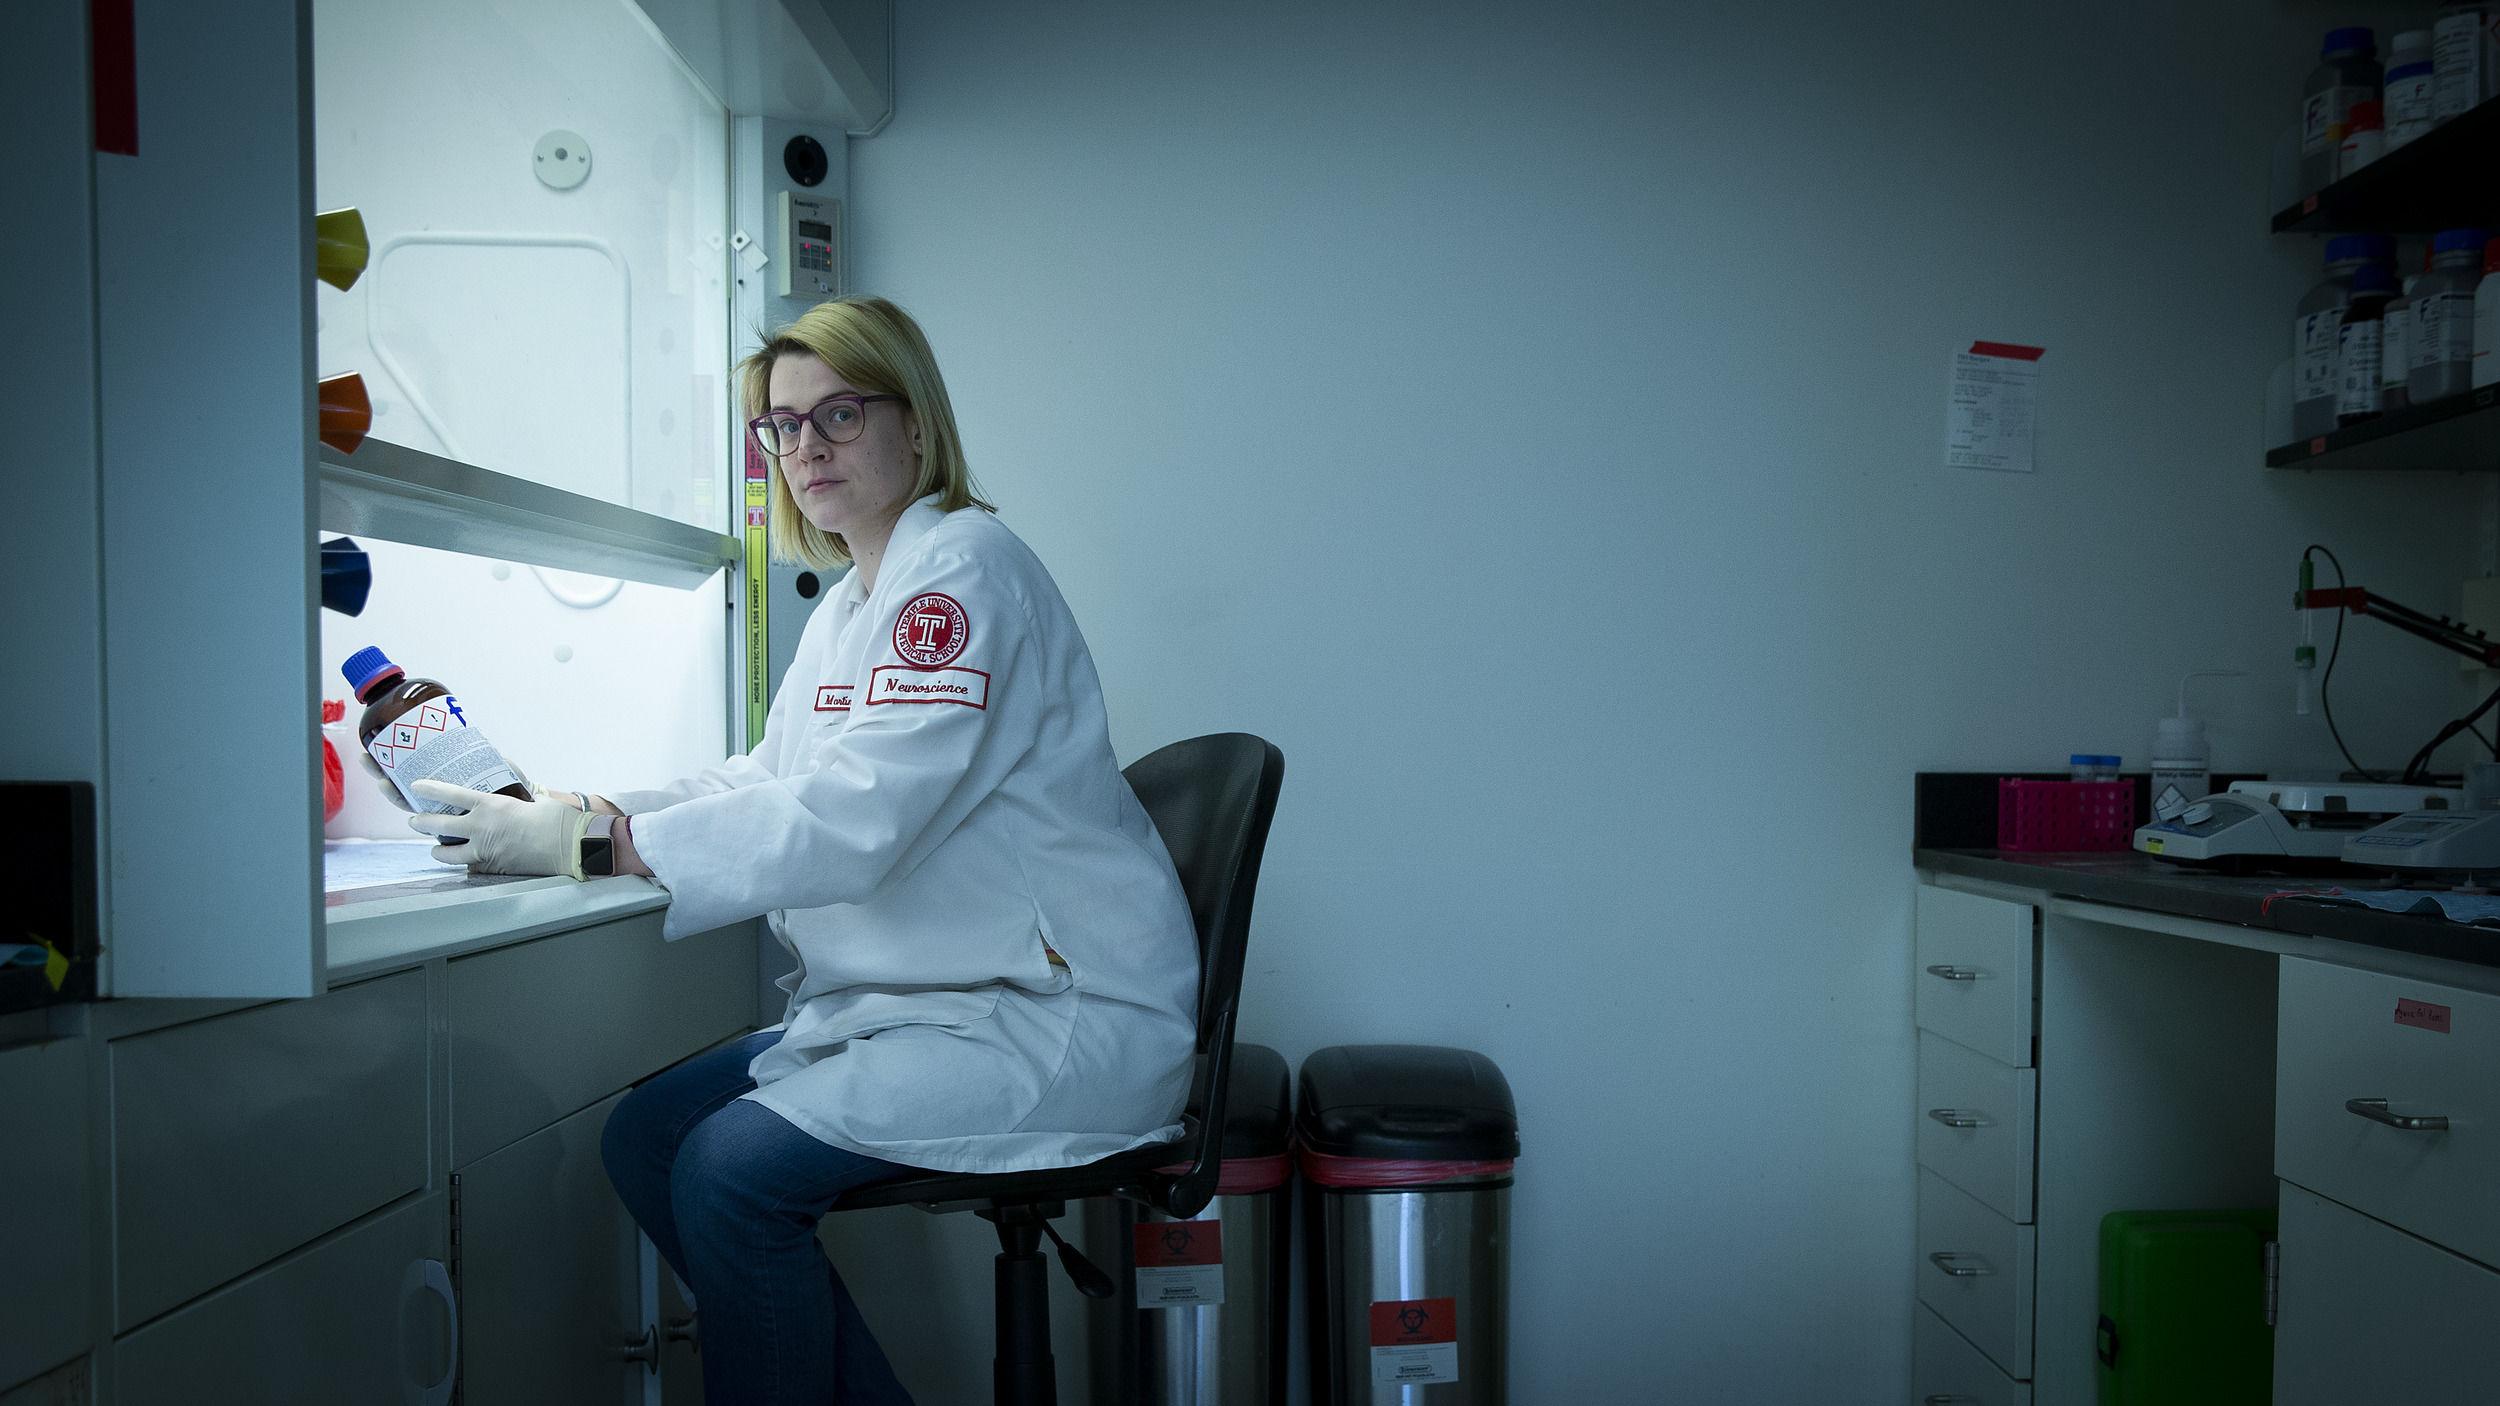 Researcher Martina Donadoni